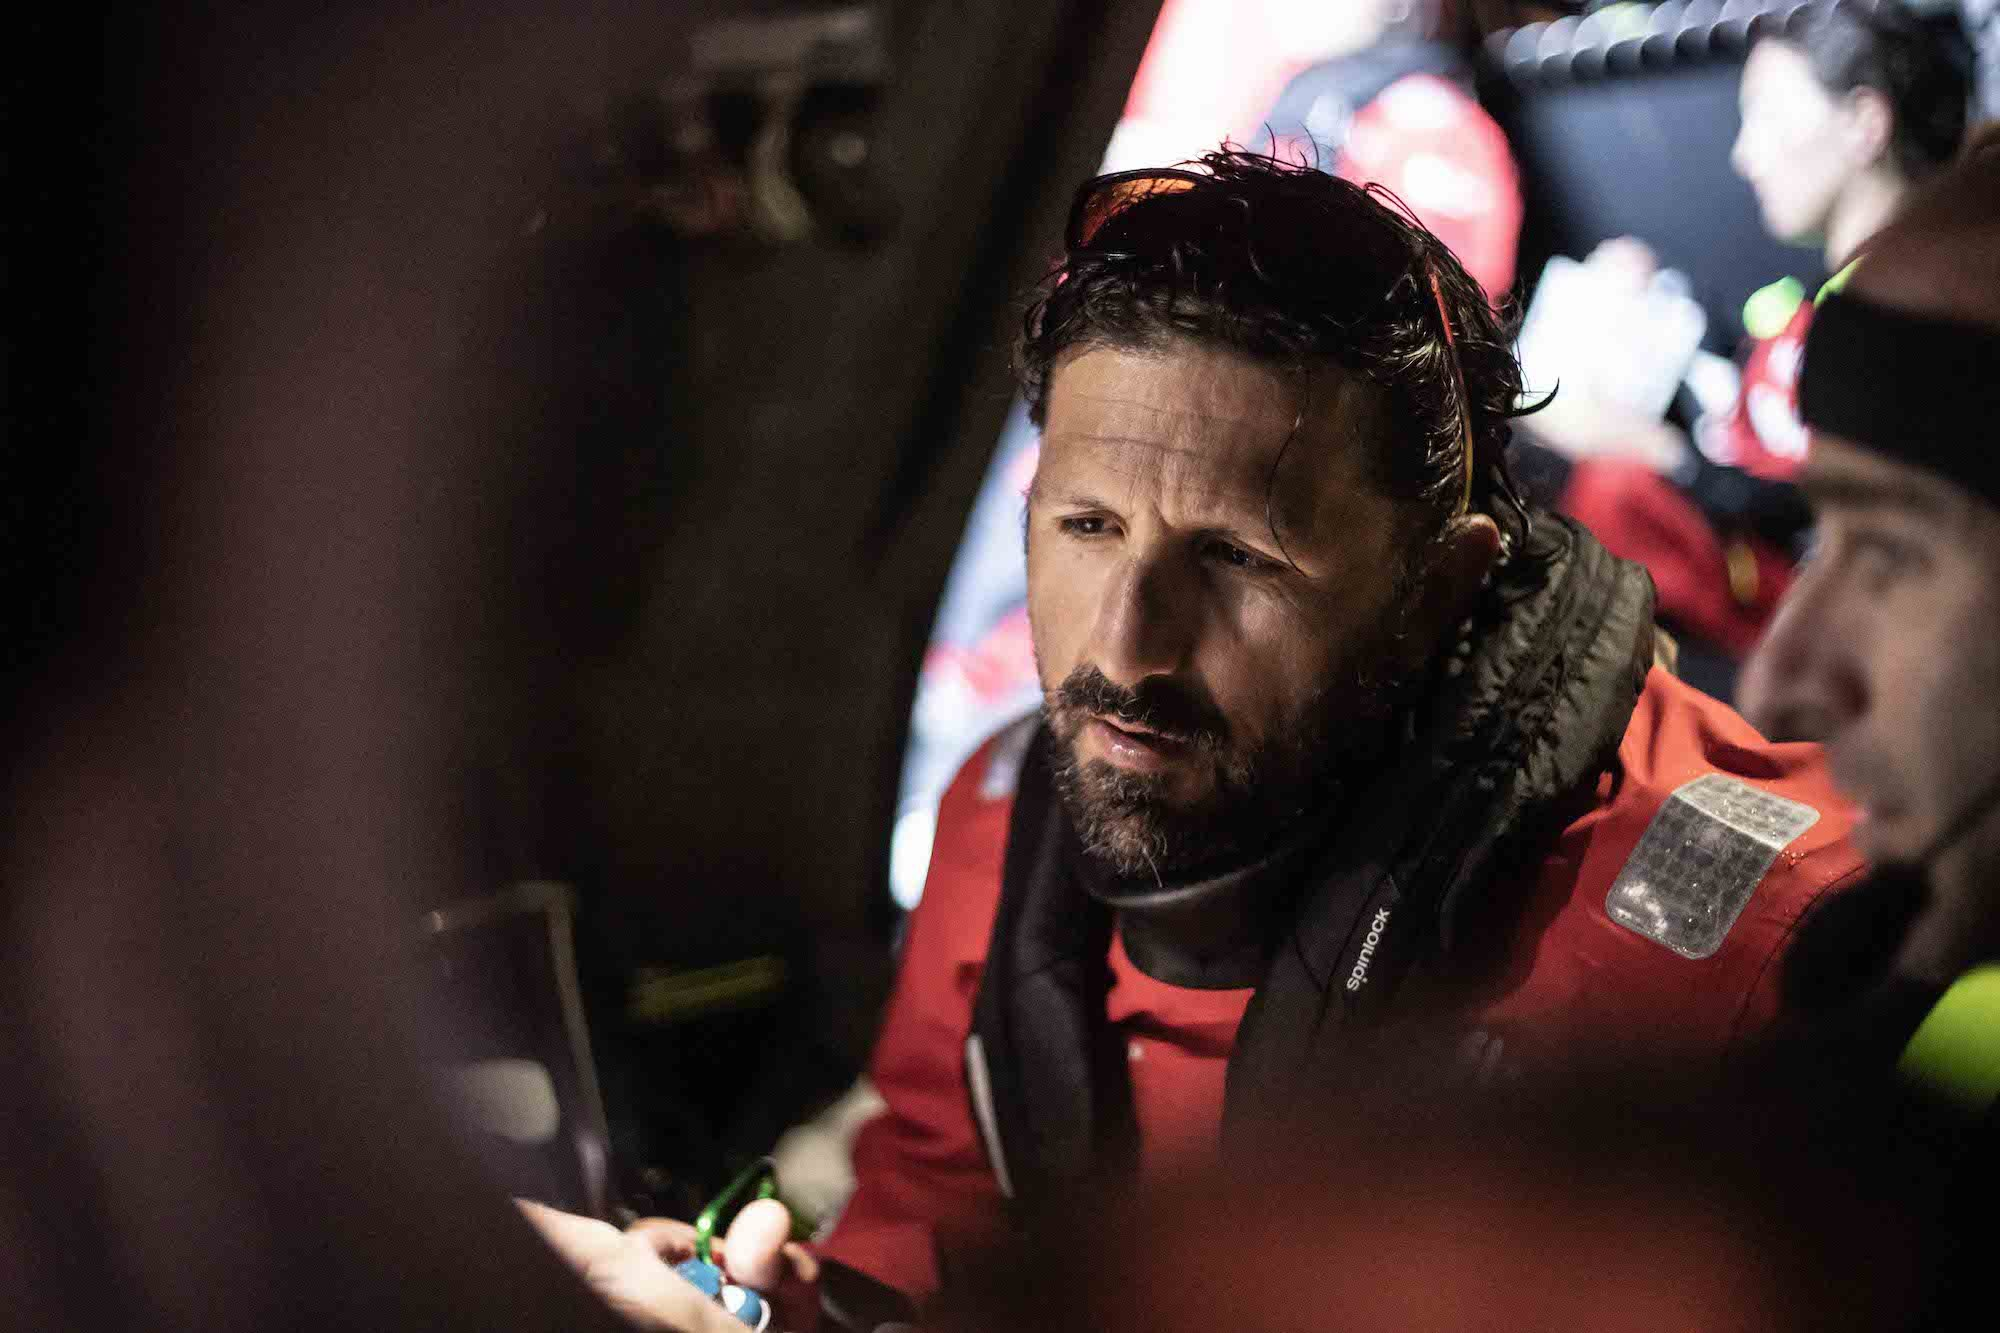 Skipper Yoann Richomme responds to final TORE route